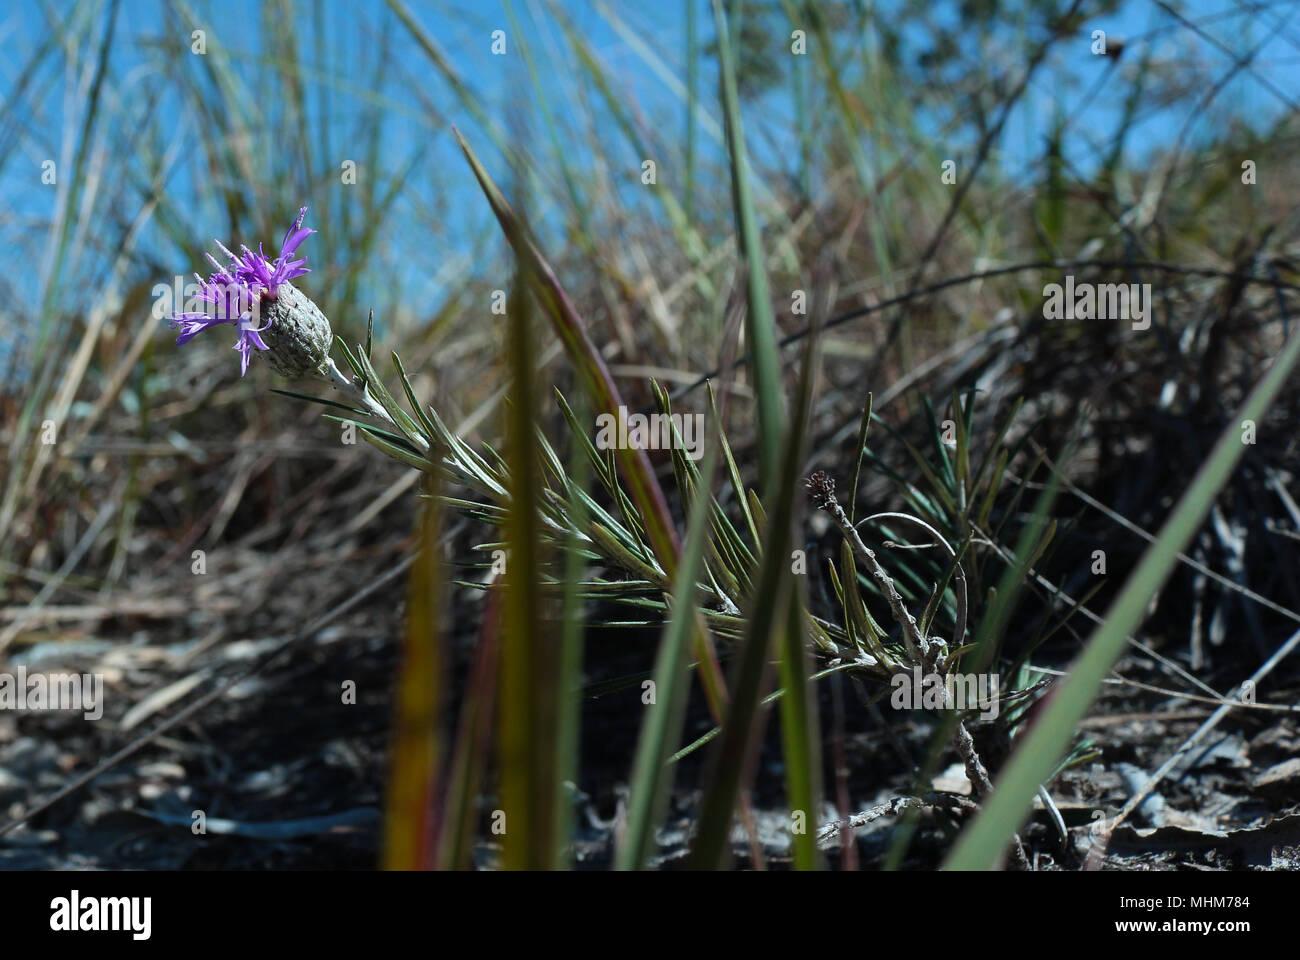 Small lilac flower, asteraceae centaurea - Stock Image